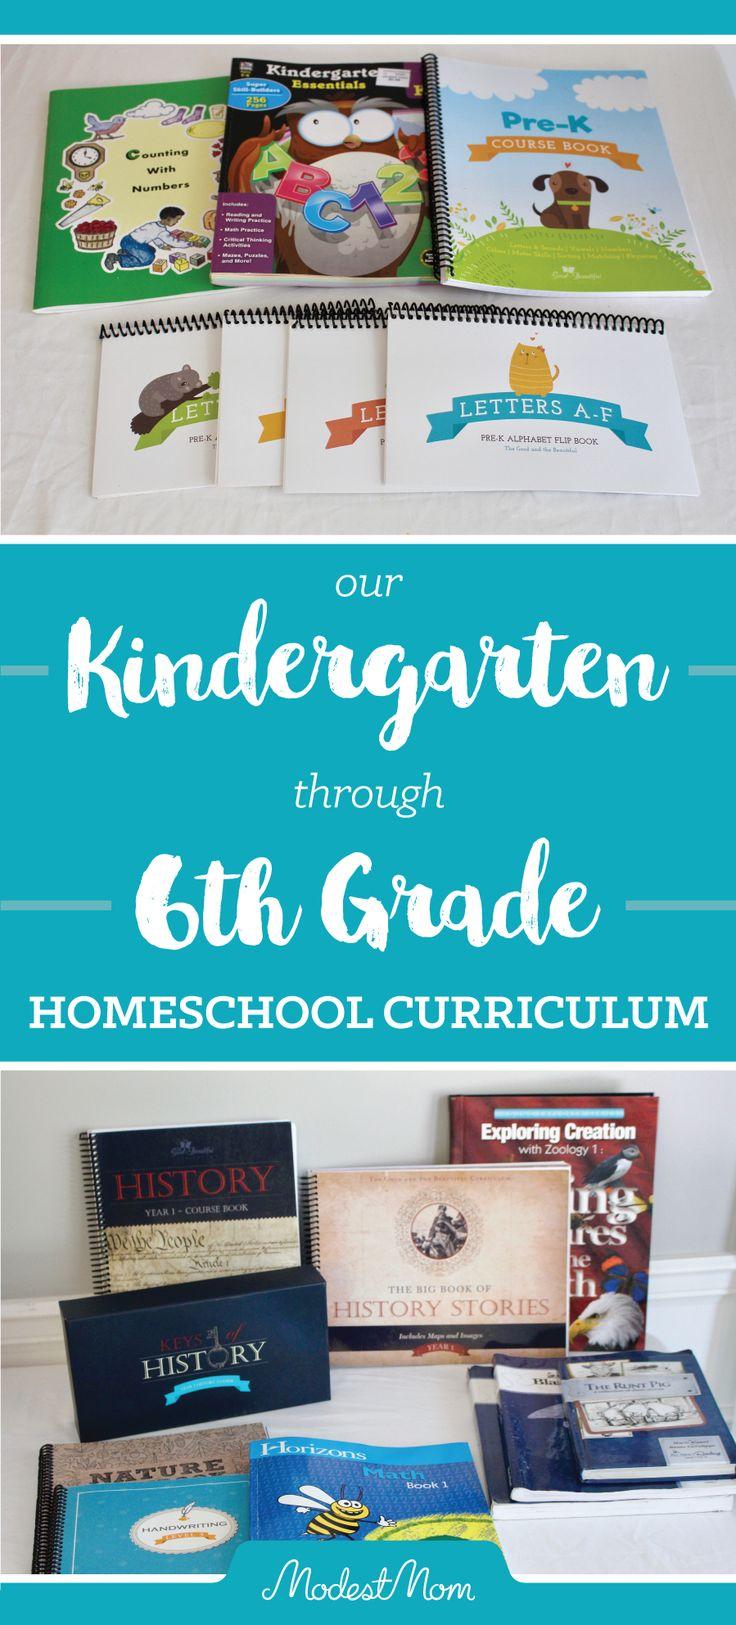 788 Best Homeschool Images On Pinterest